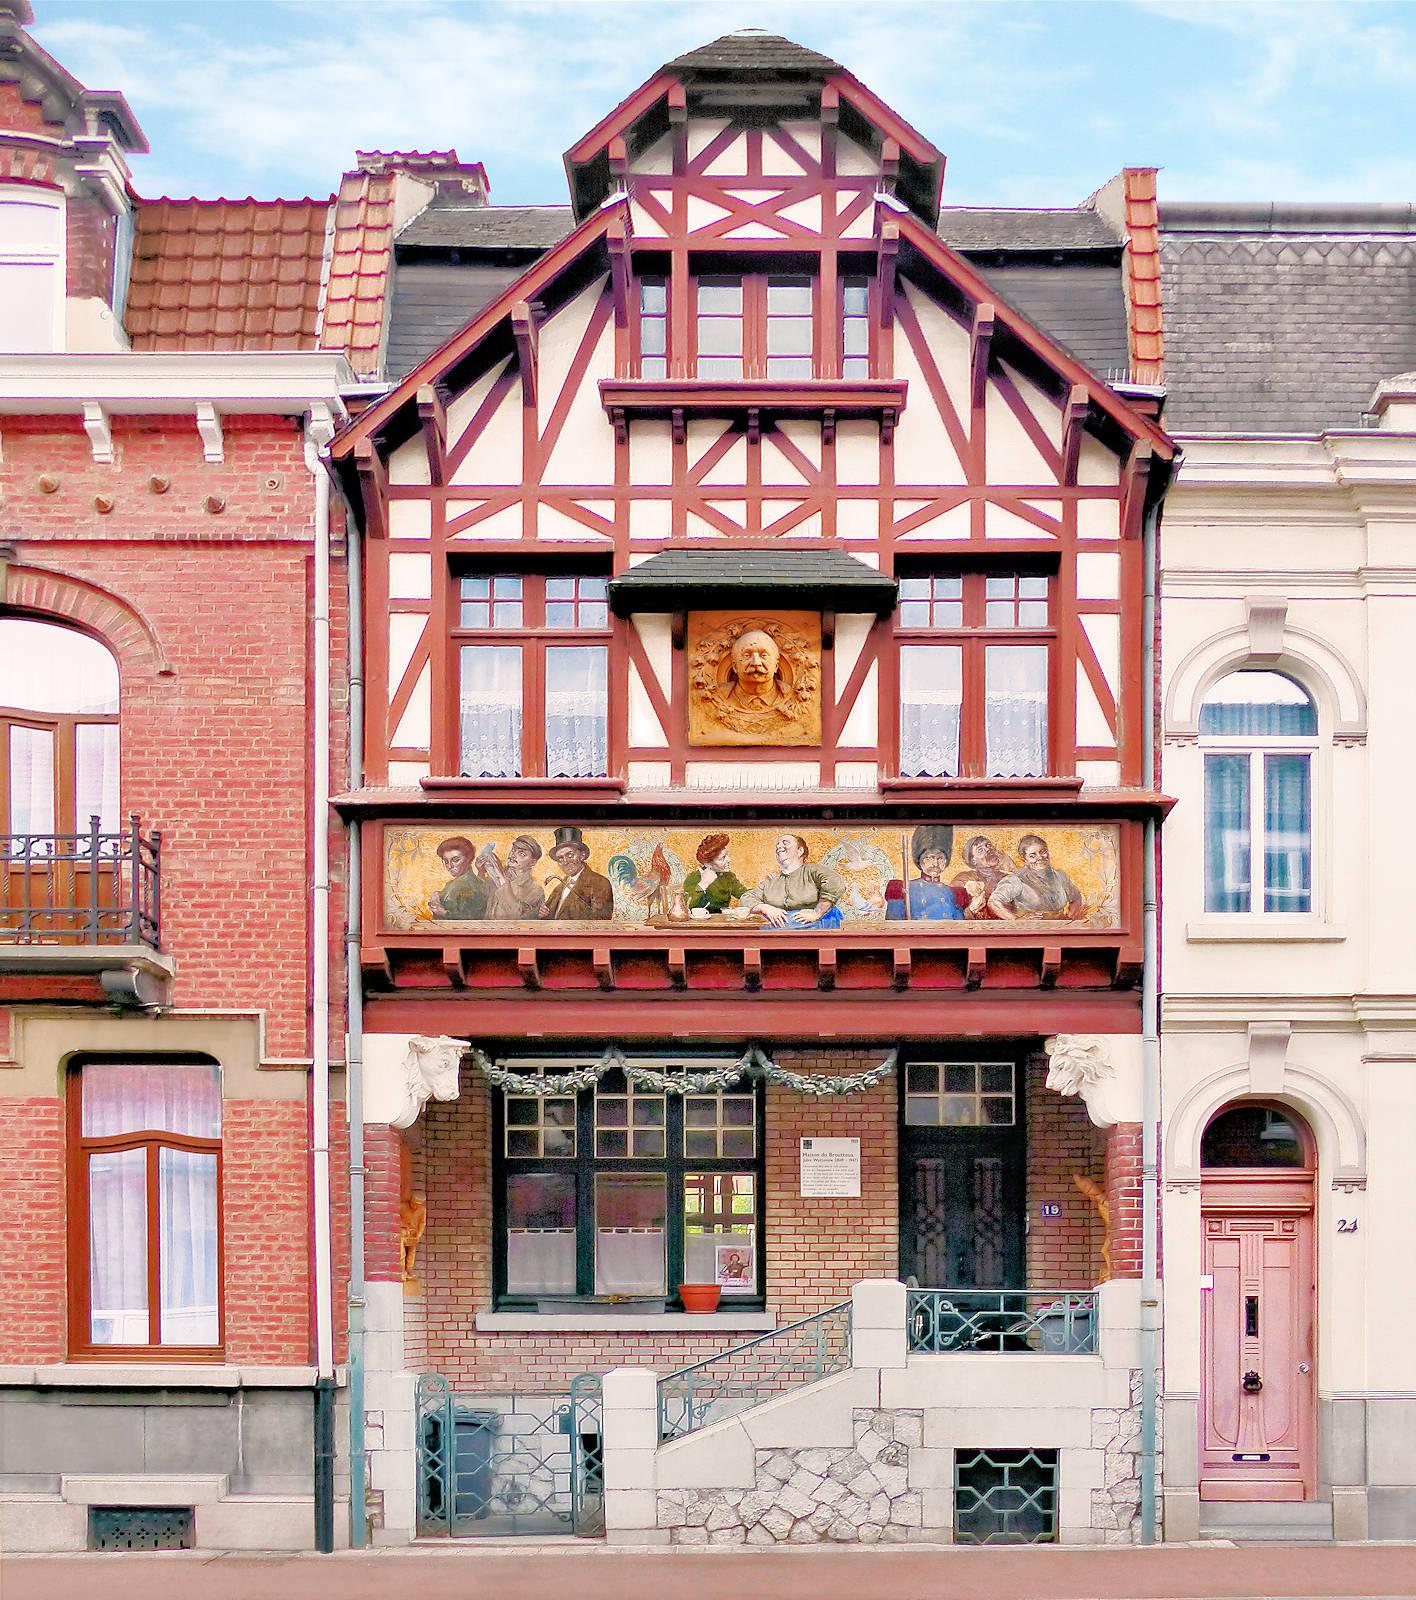 Maison du Broutteux - rue Hules Watteeuw, Tourcoing